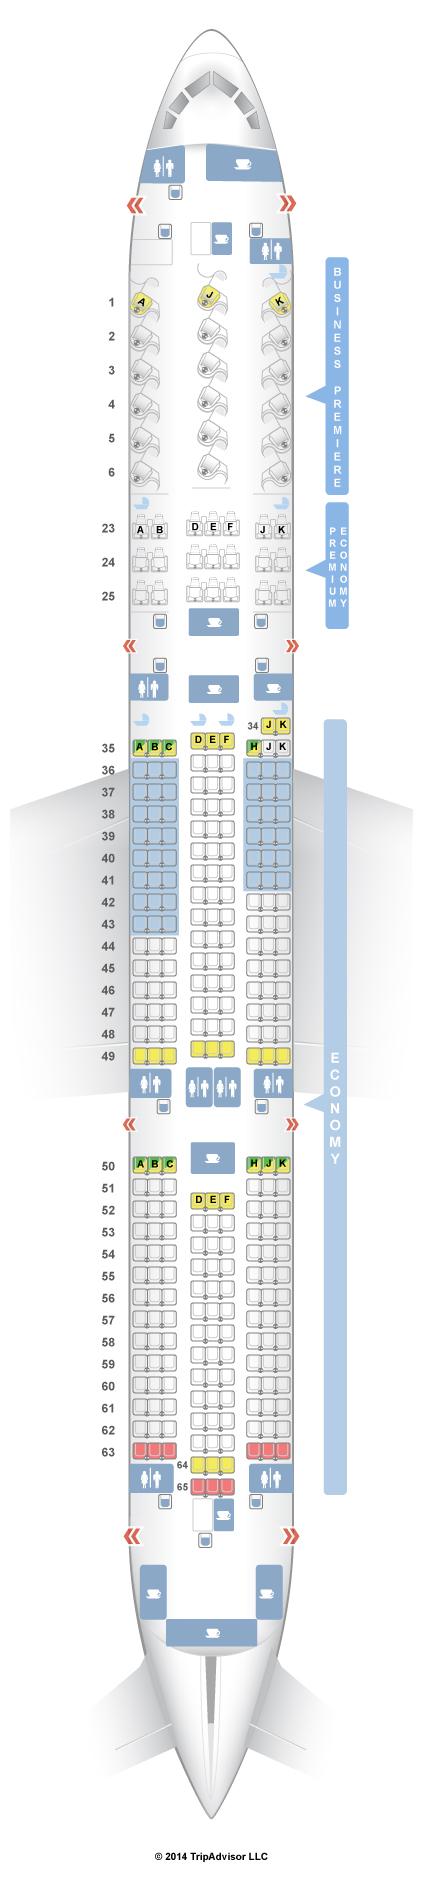 Air_New_Zealand_Boeing_787-9.jpg